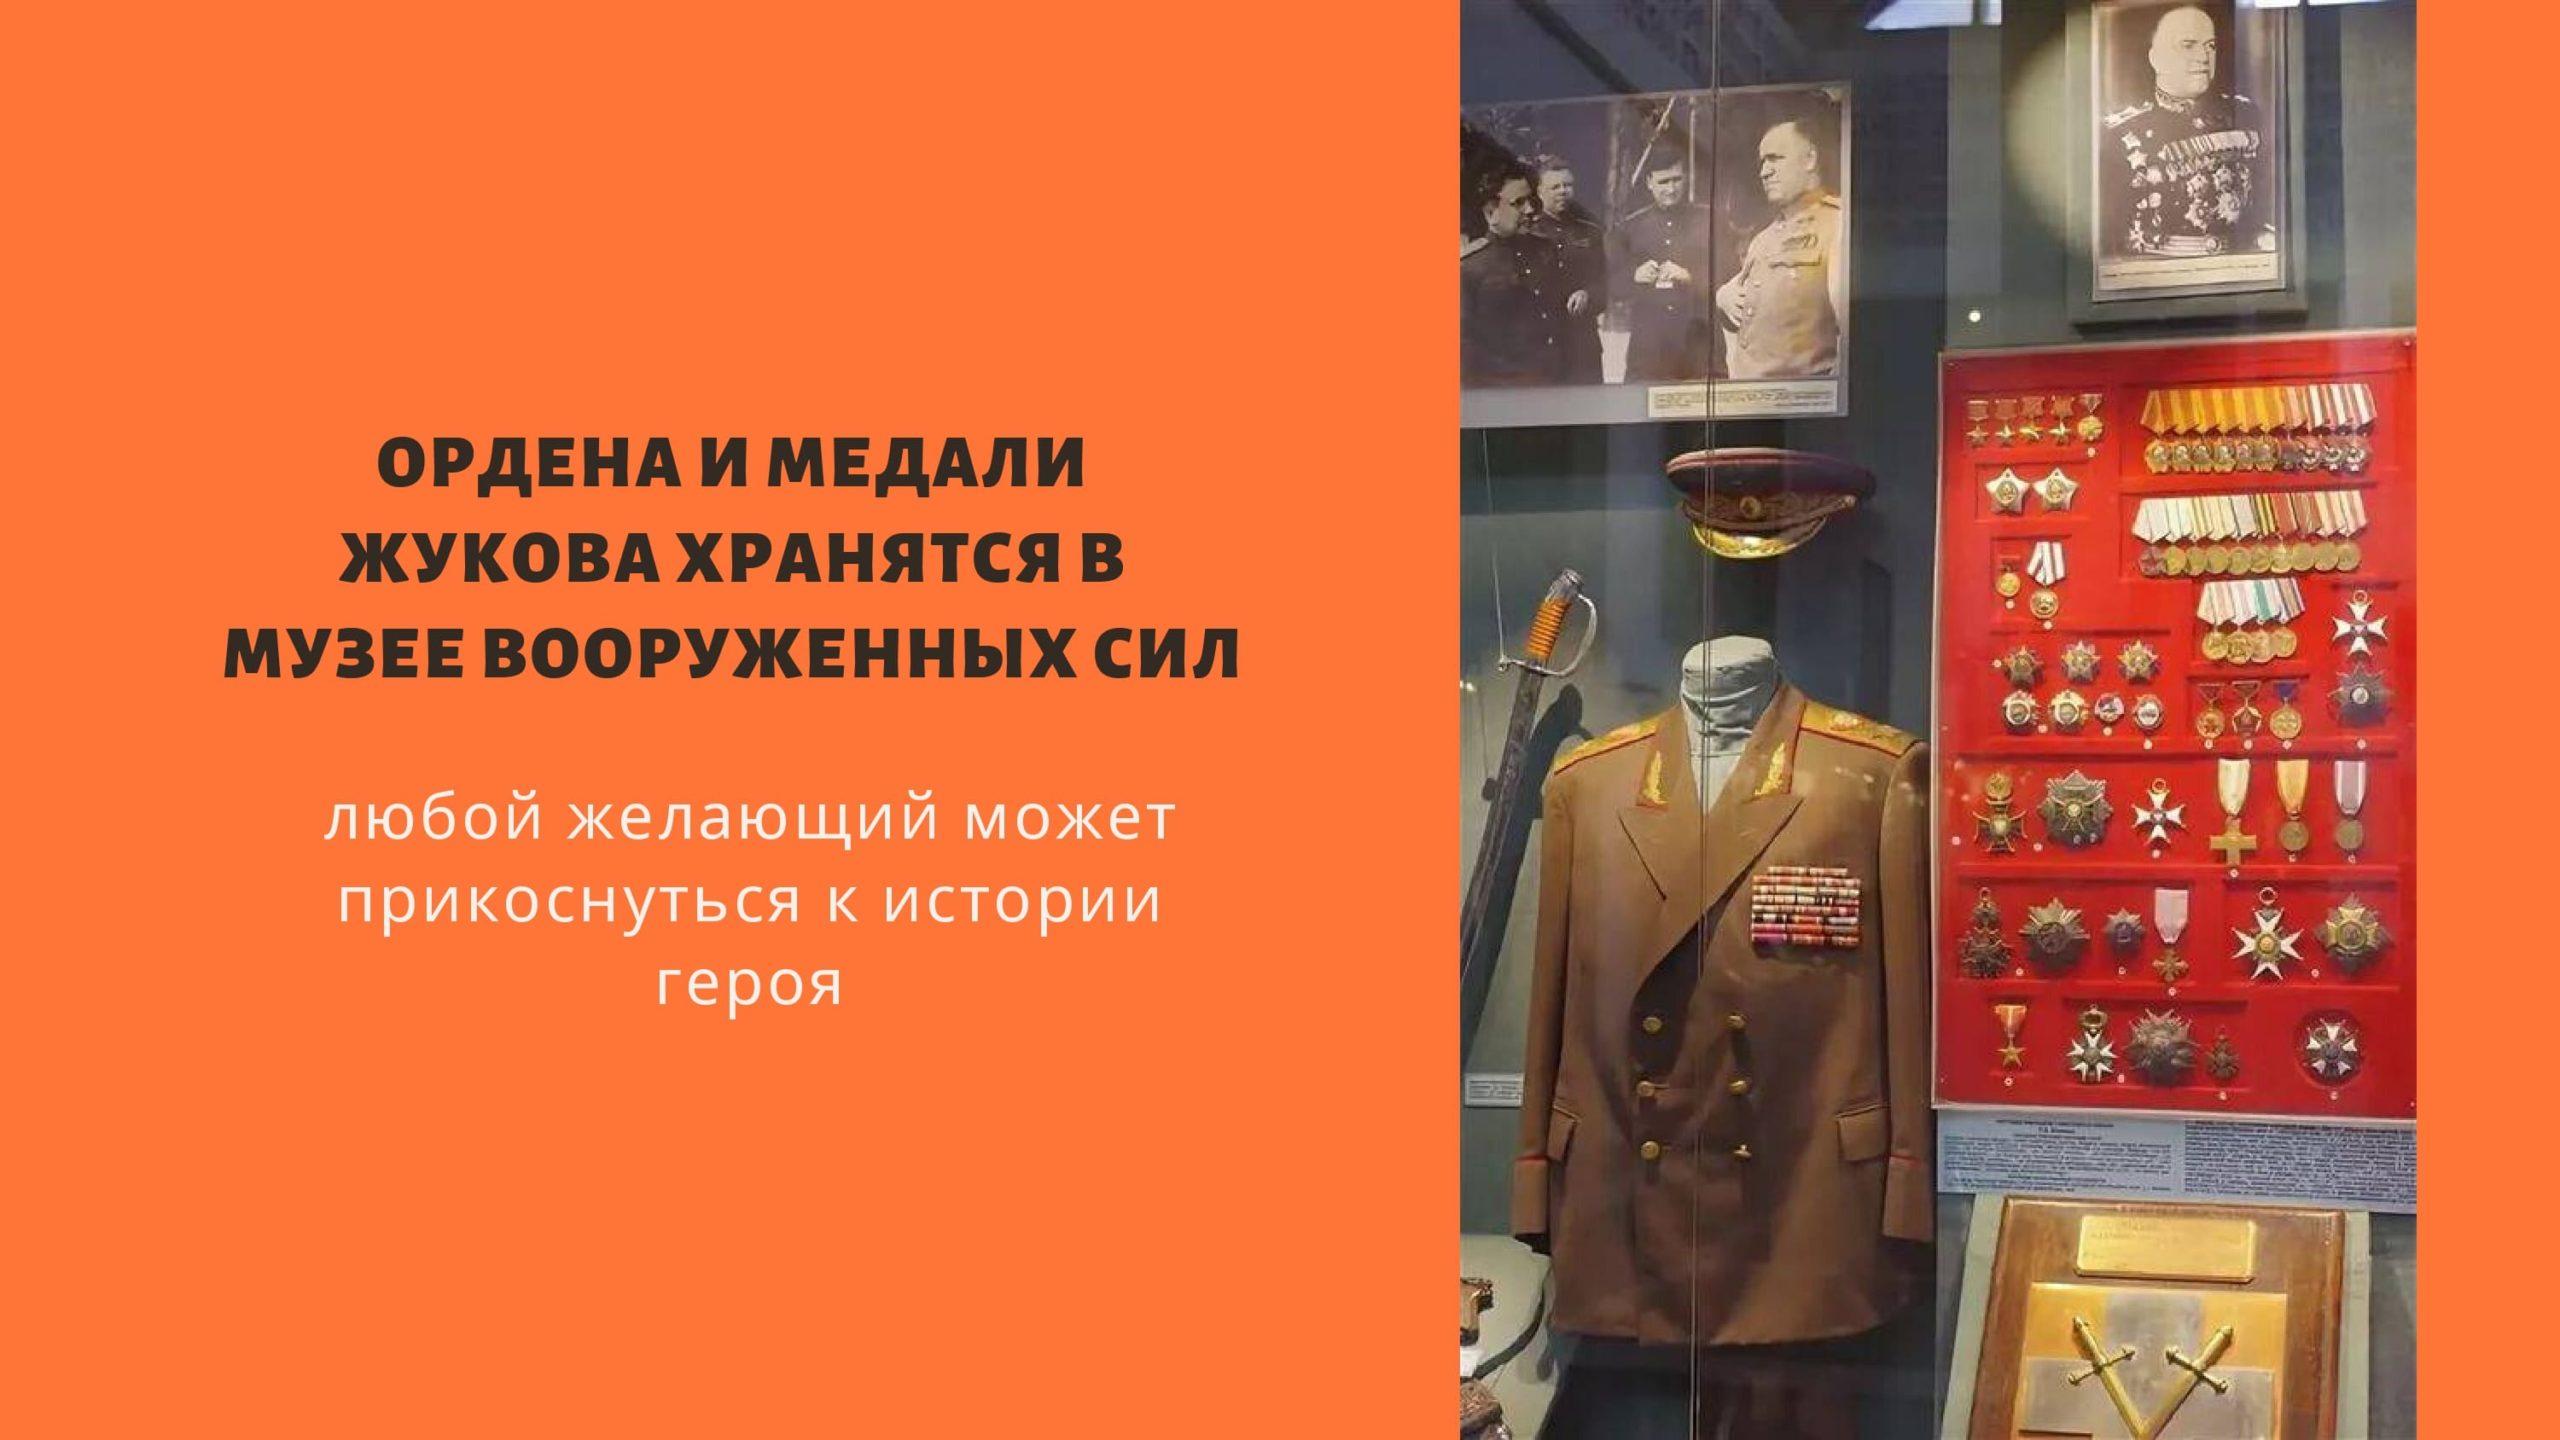 Ордена и медали. Георгий Константинович Жуков